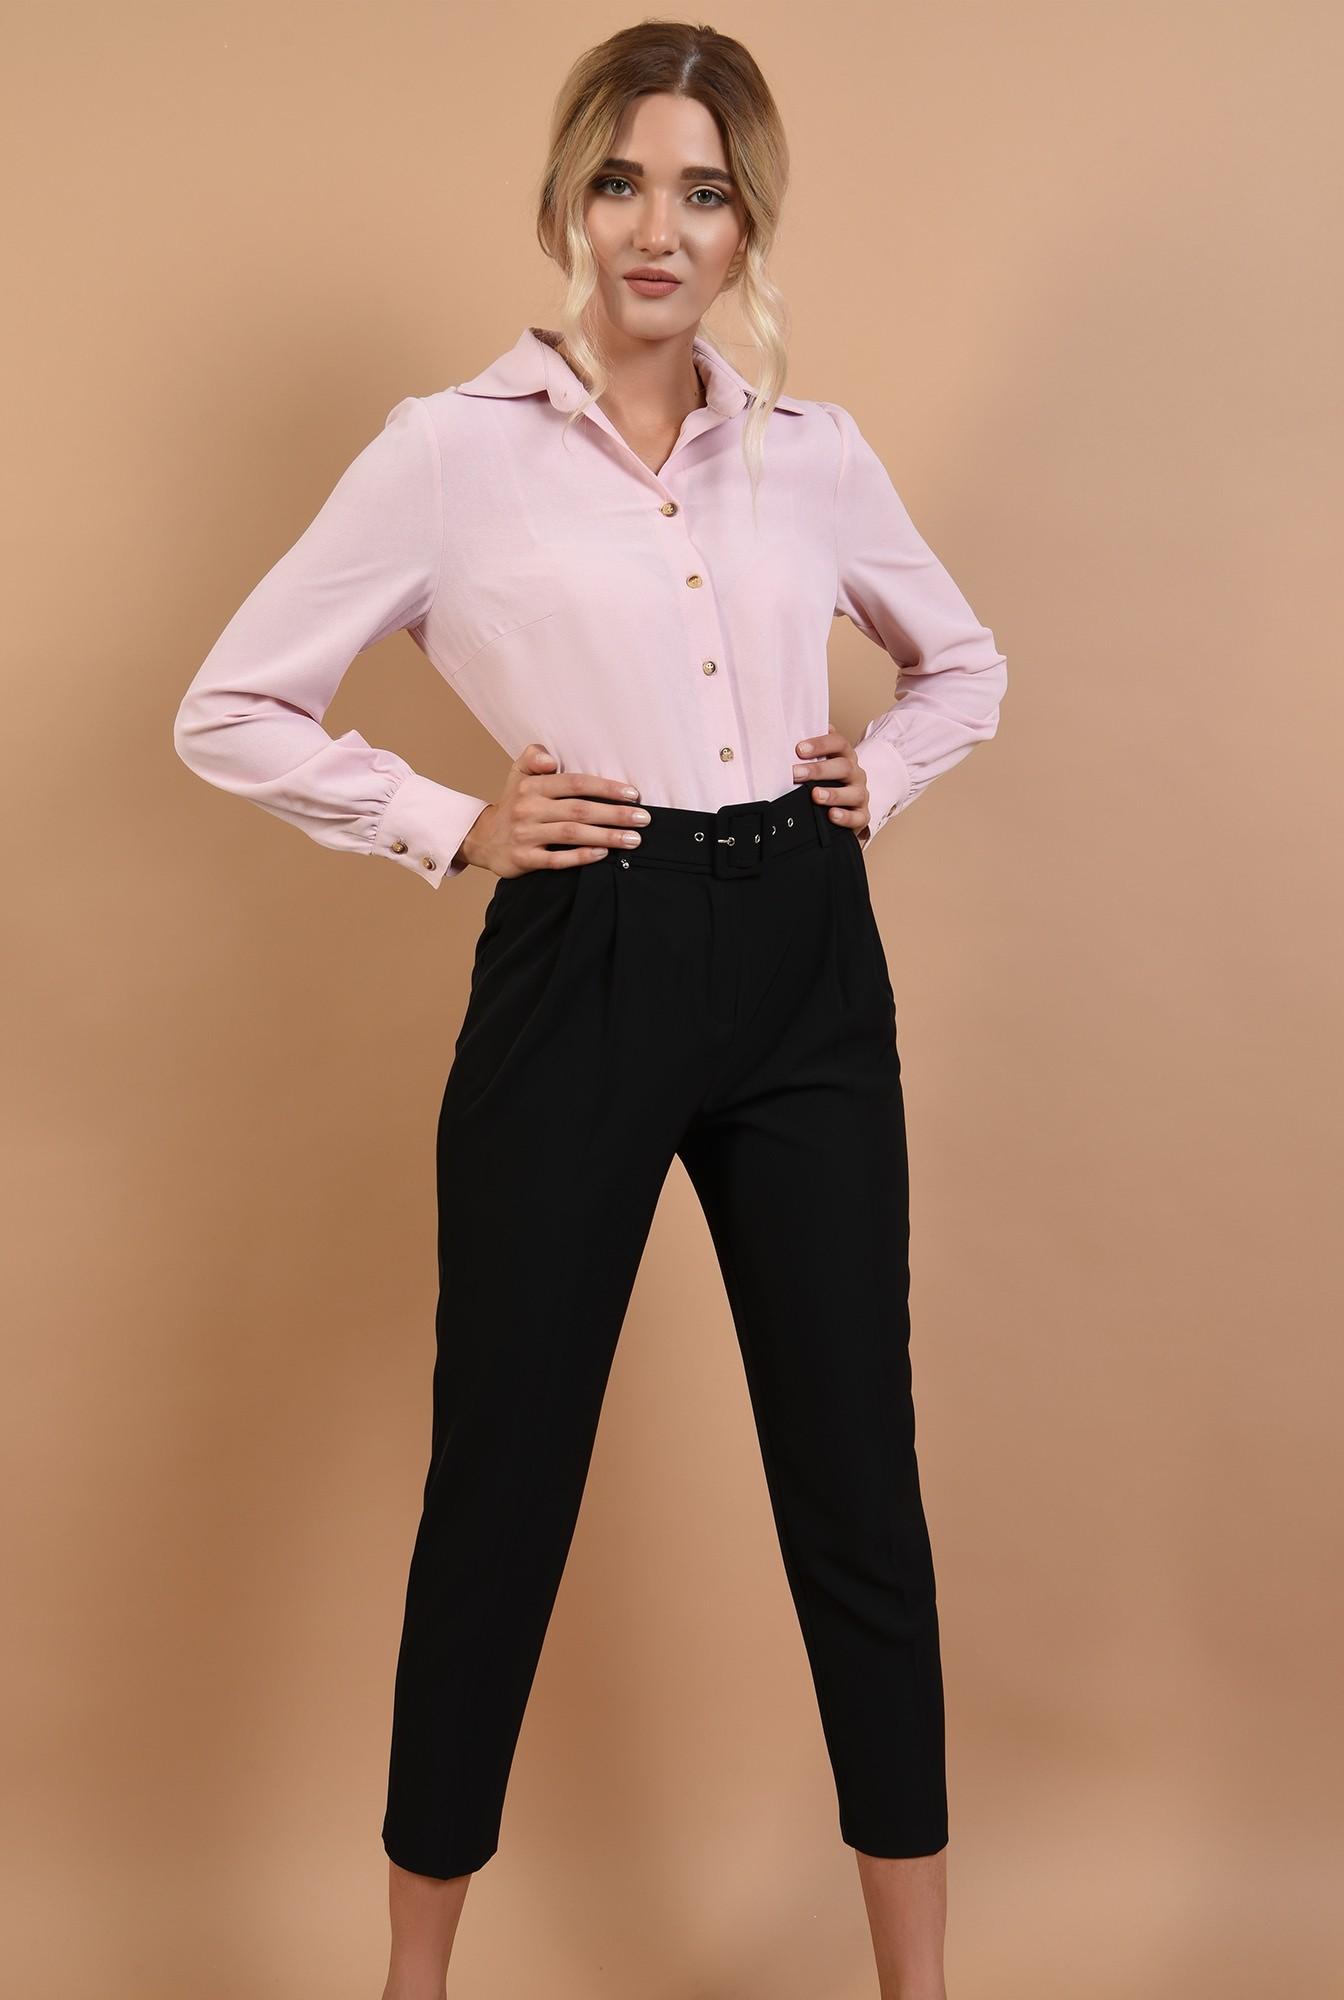 0 - camasa Poema, roz, office, cu nasturi, maneci lungi cu mansete